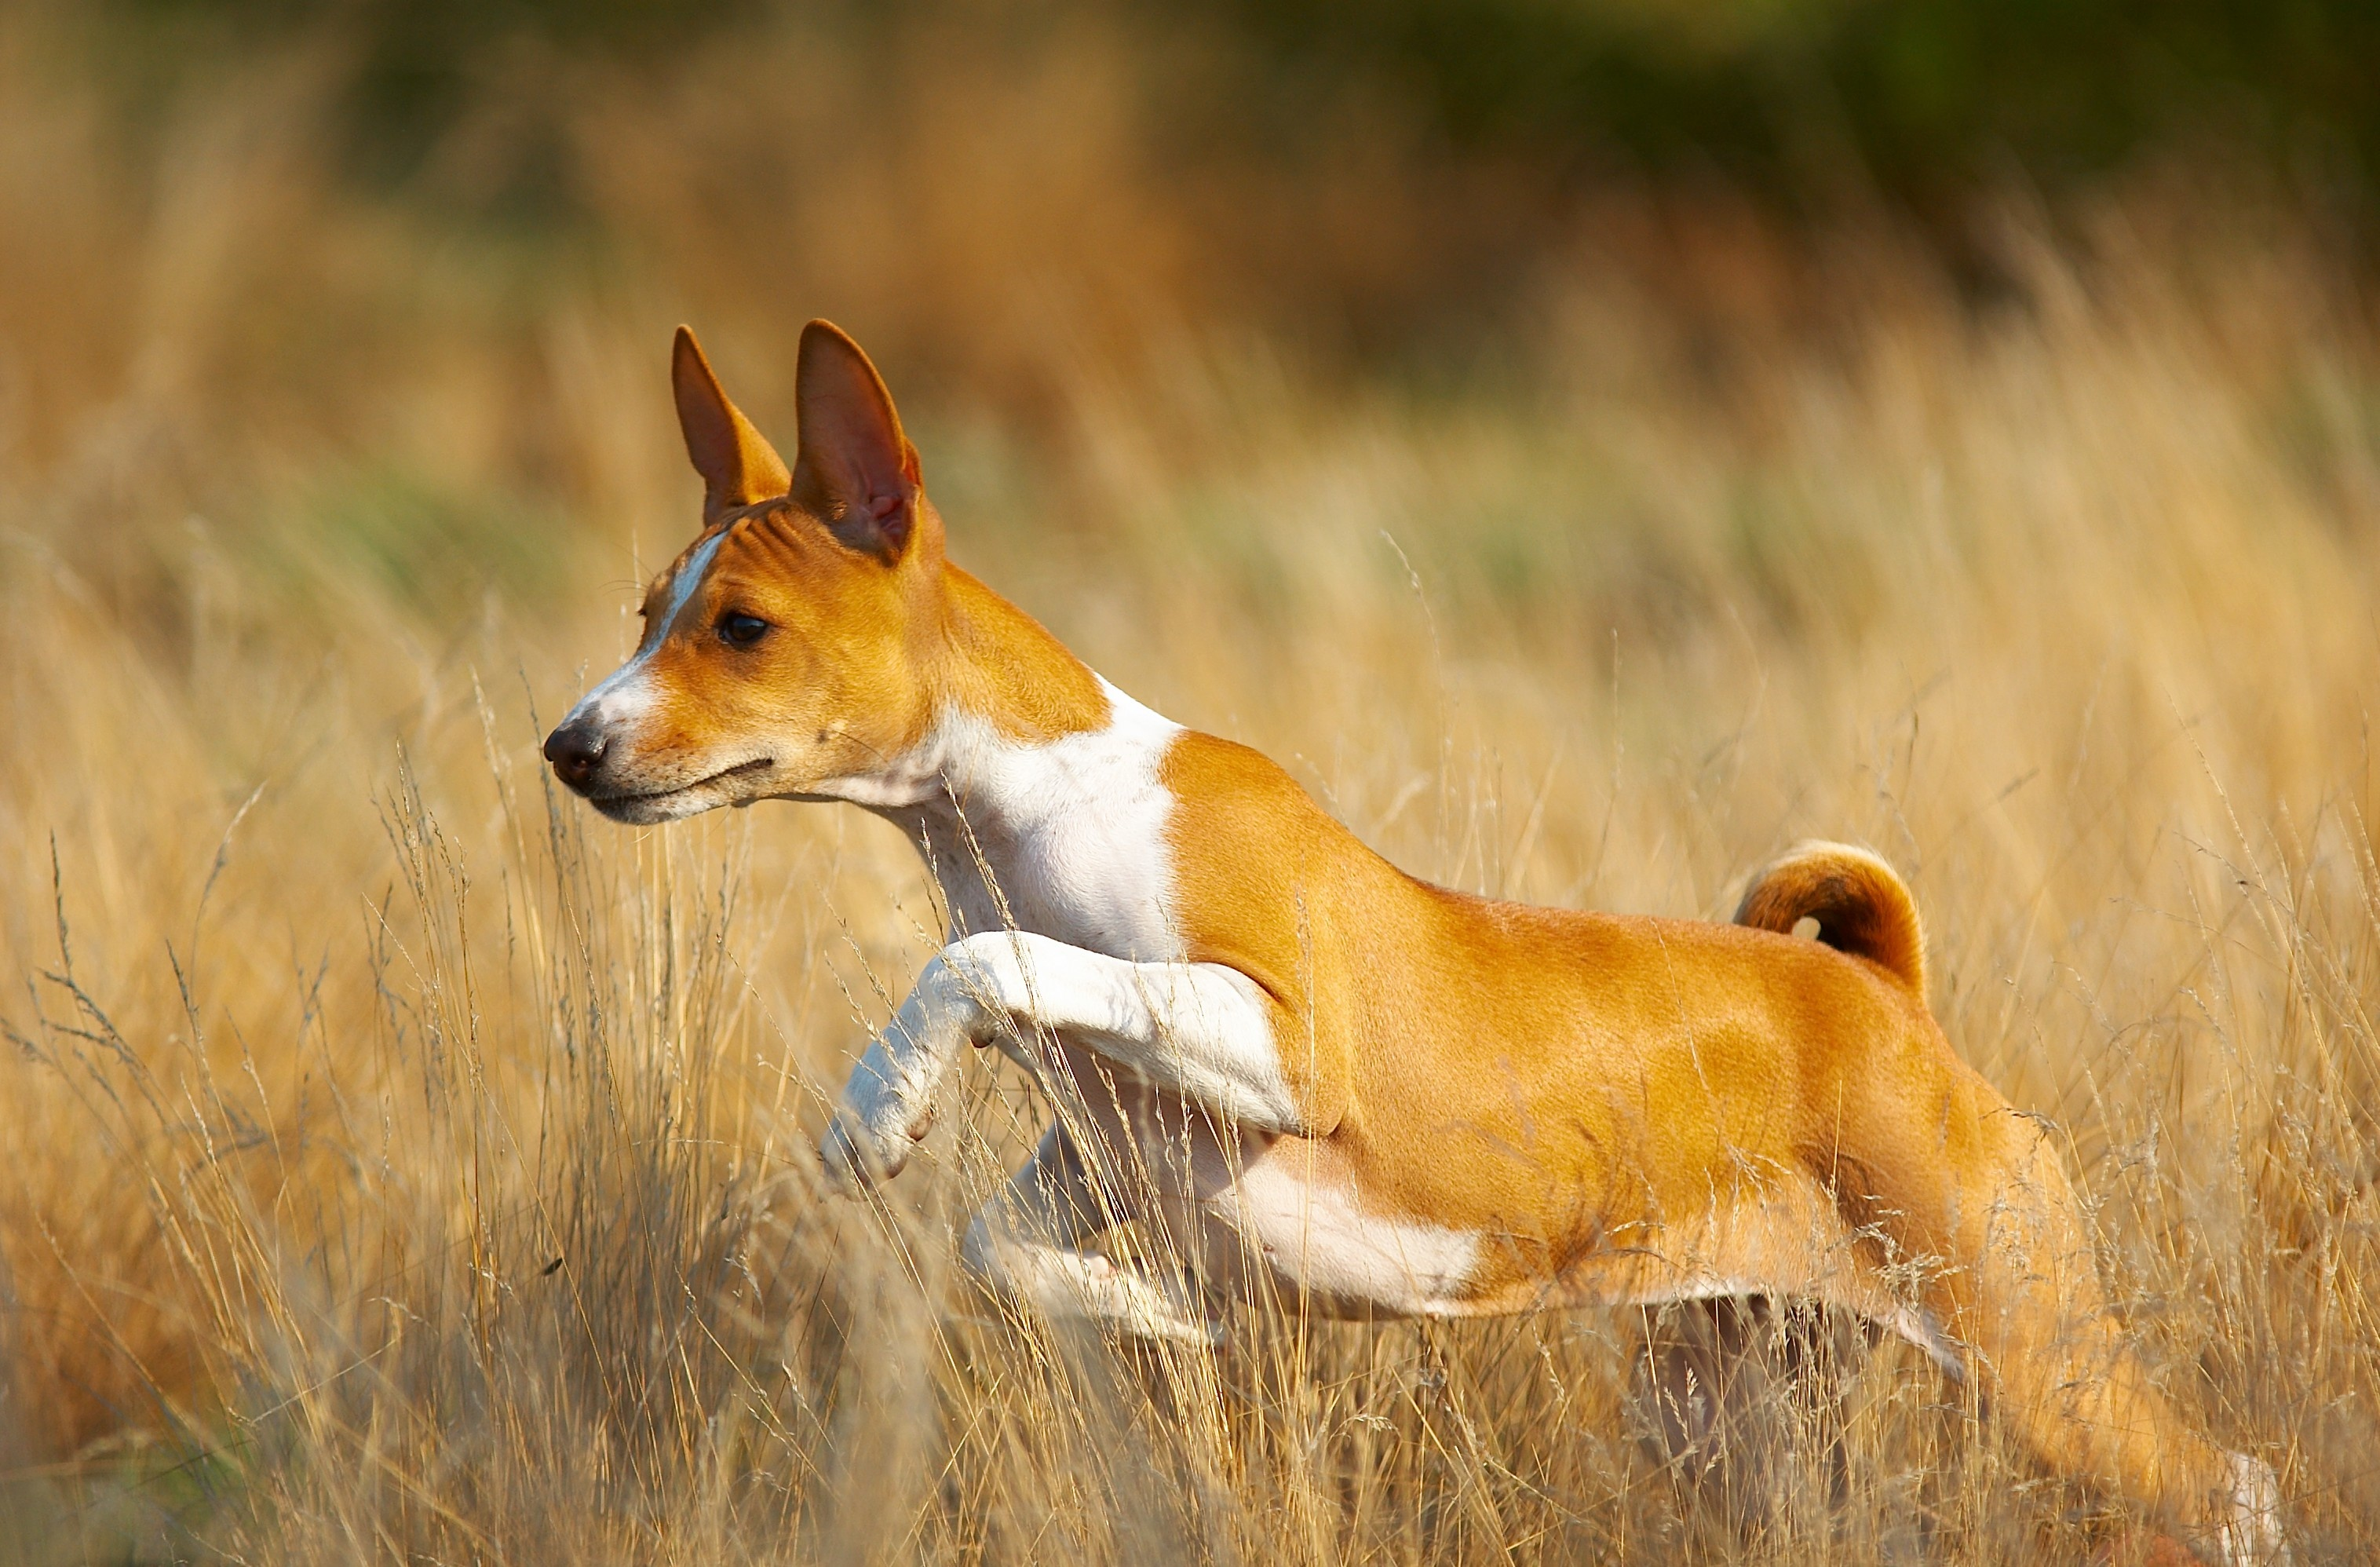 Basenji dog leaping through a field of tall grass.